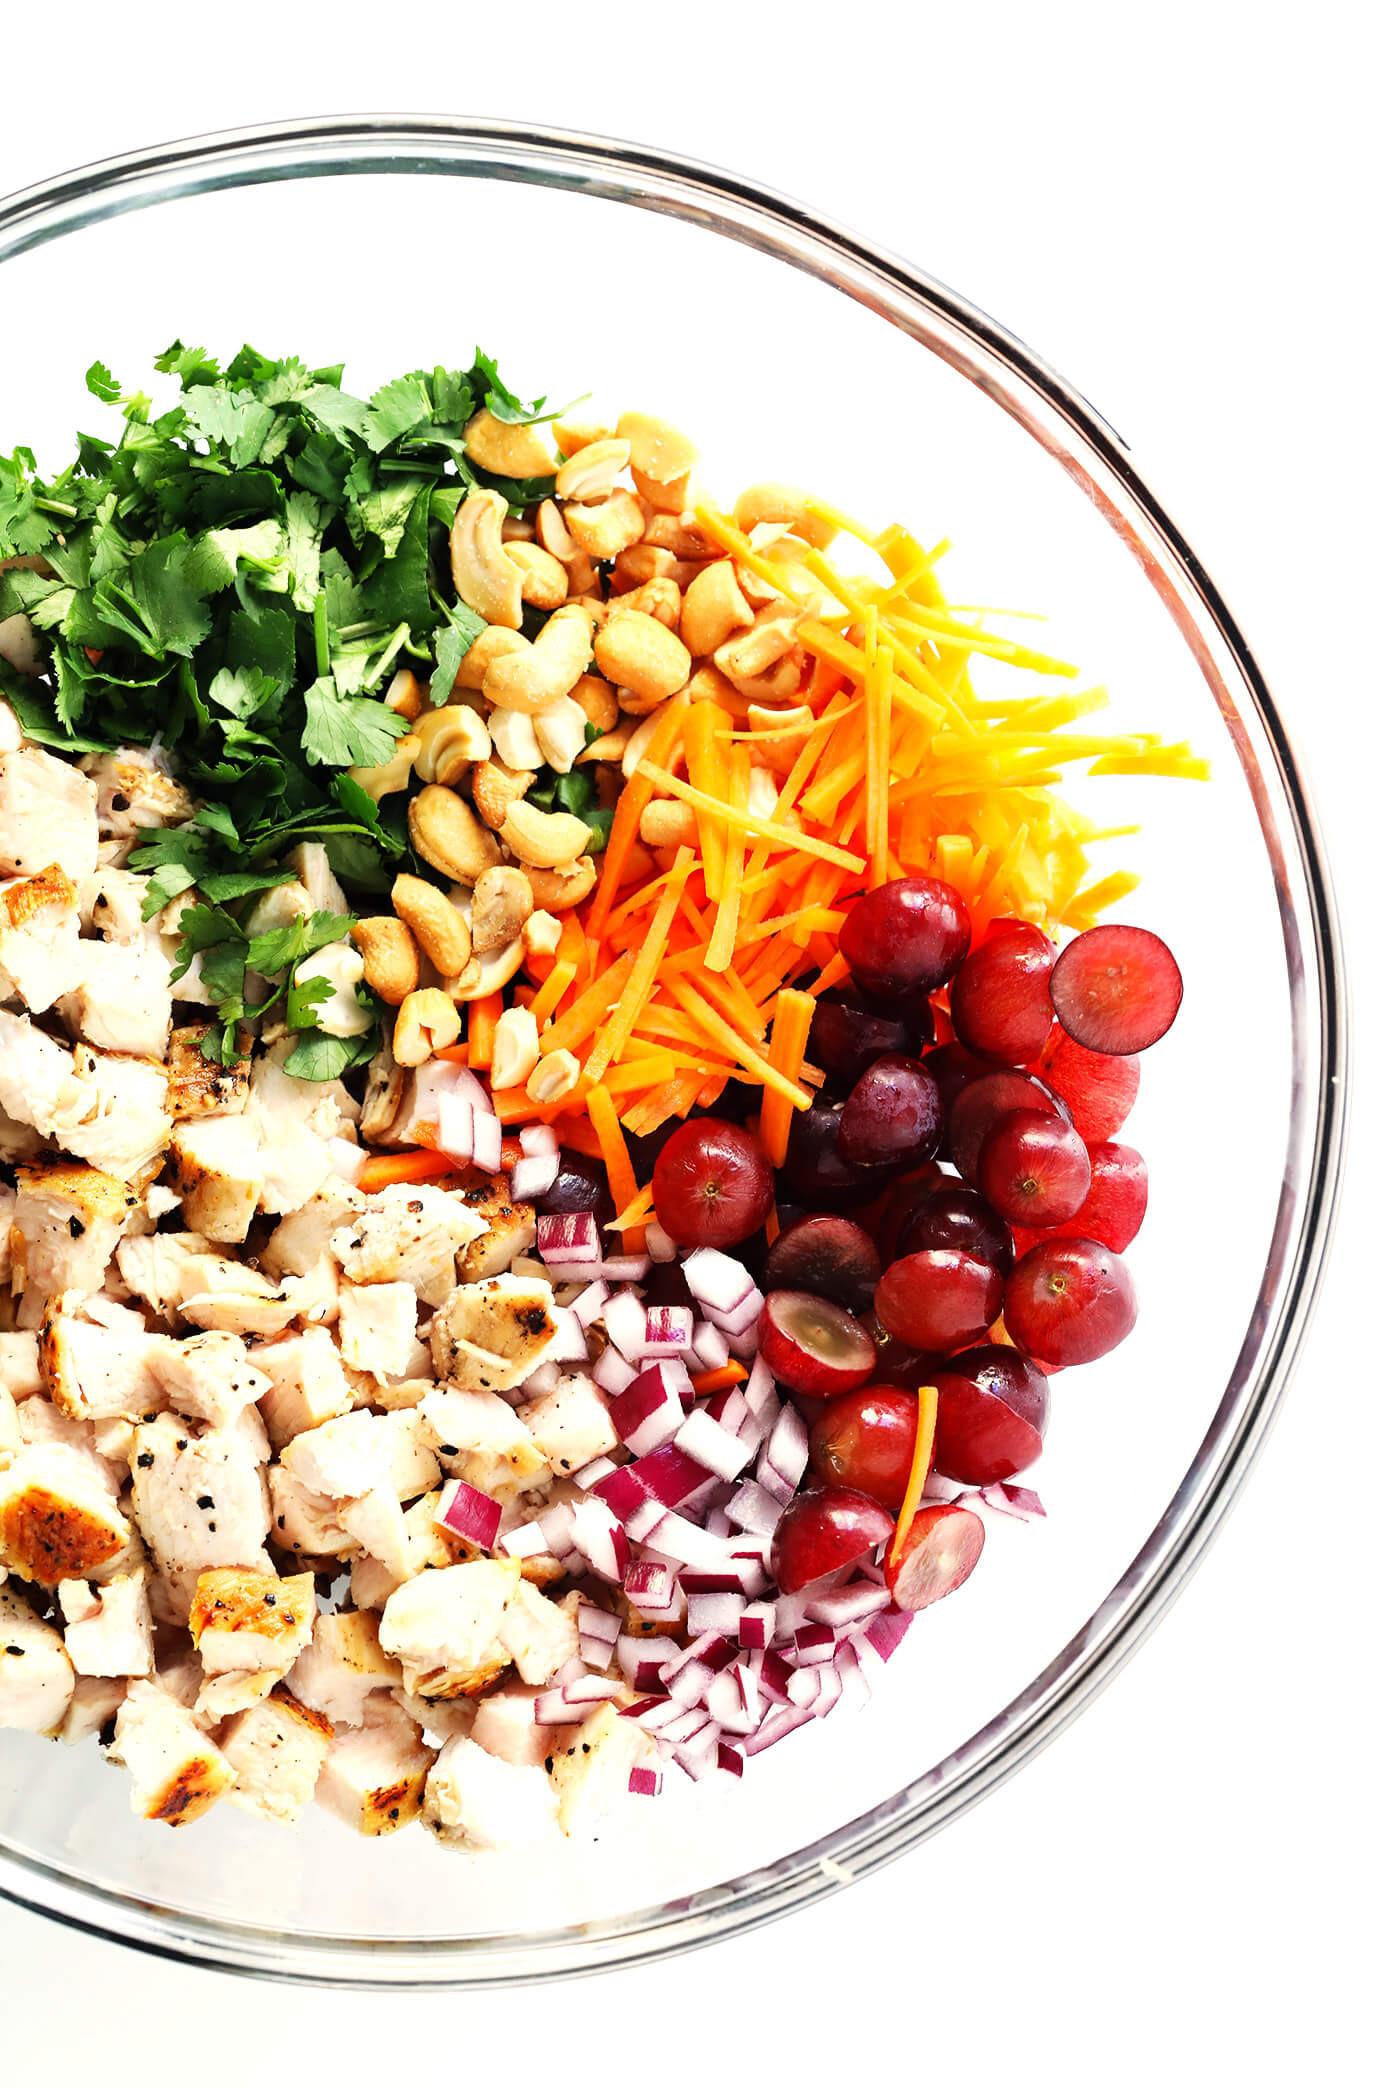 Curried Chicken Salad Healthy  Healthy Curry Chicken Salad